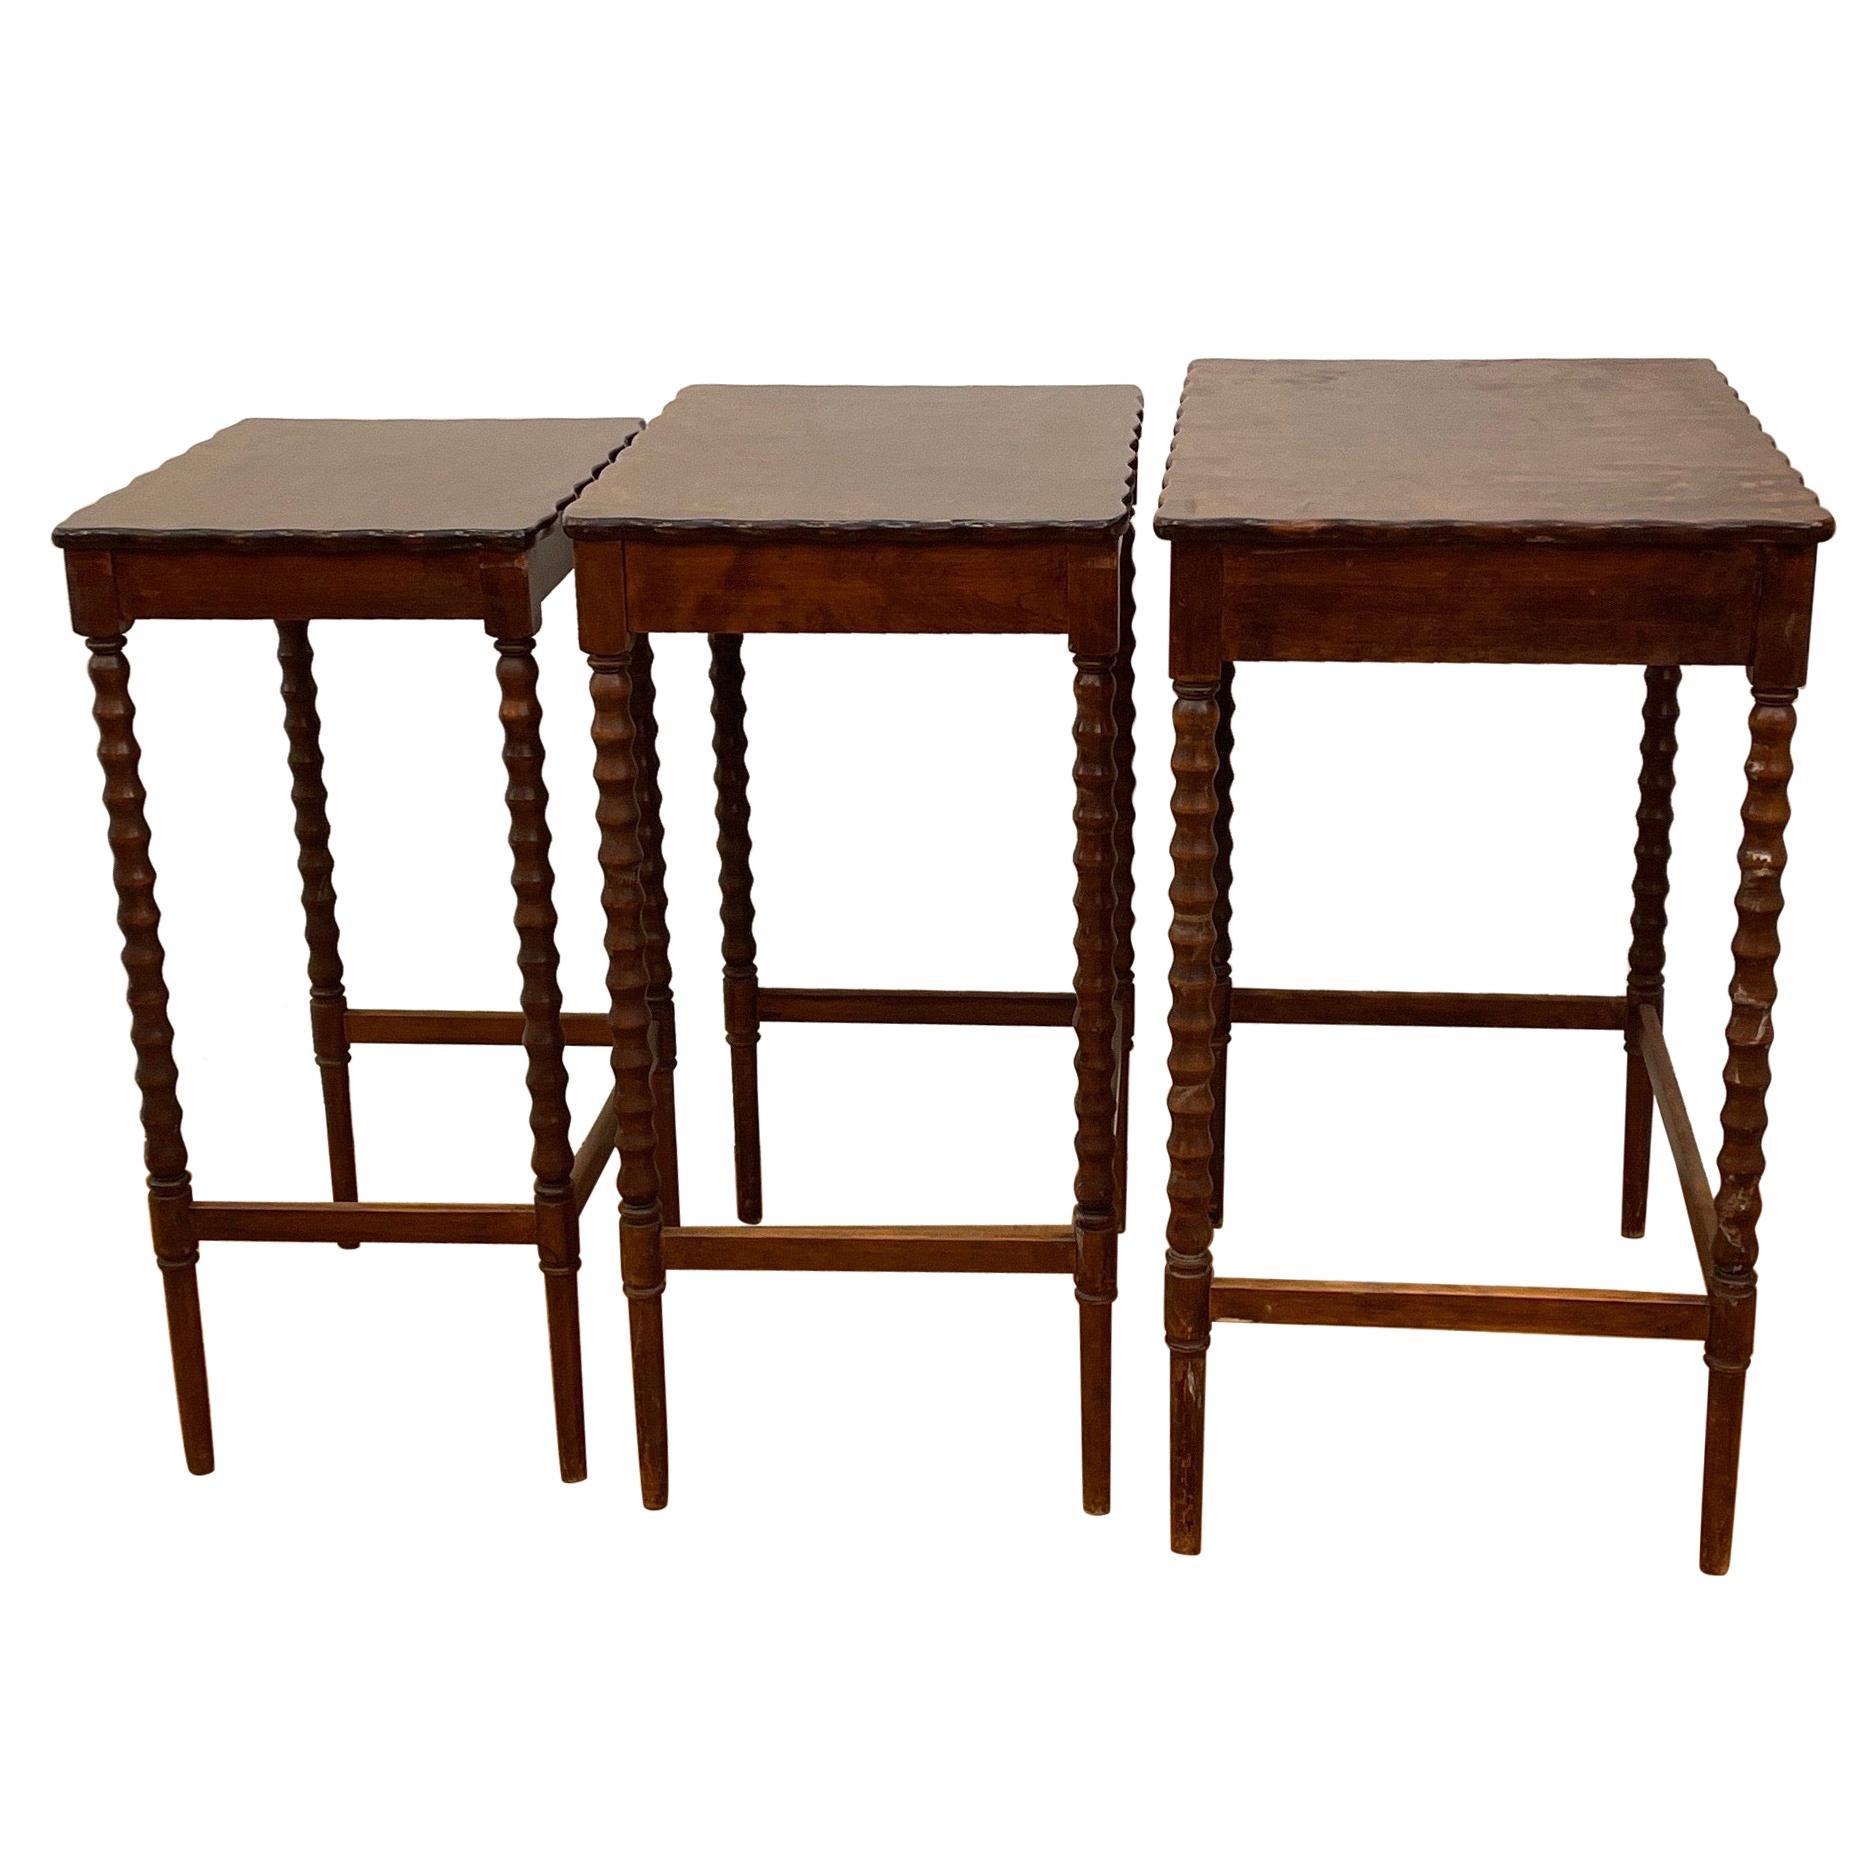 19th Century Nesting Tables